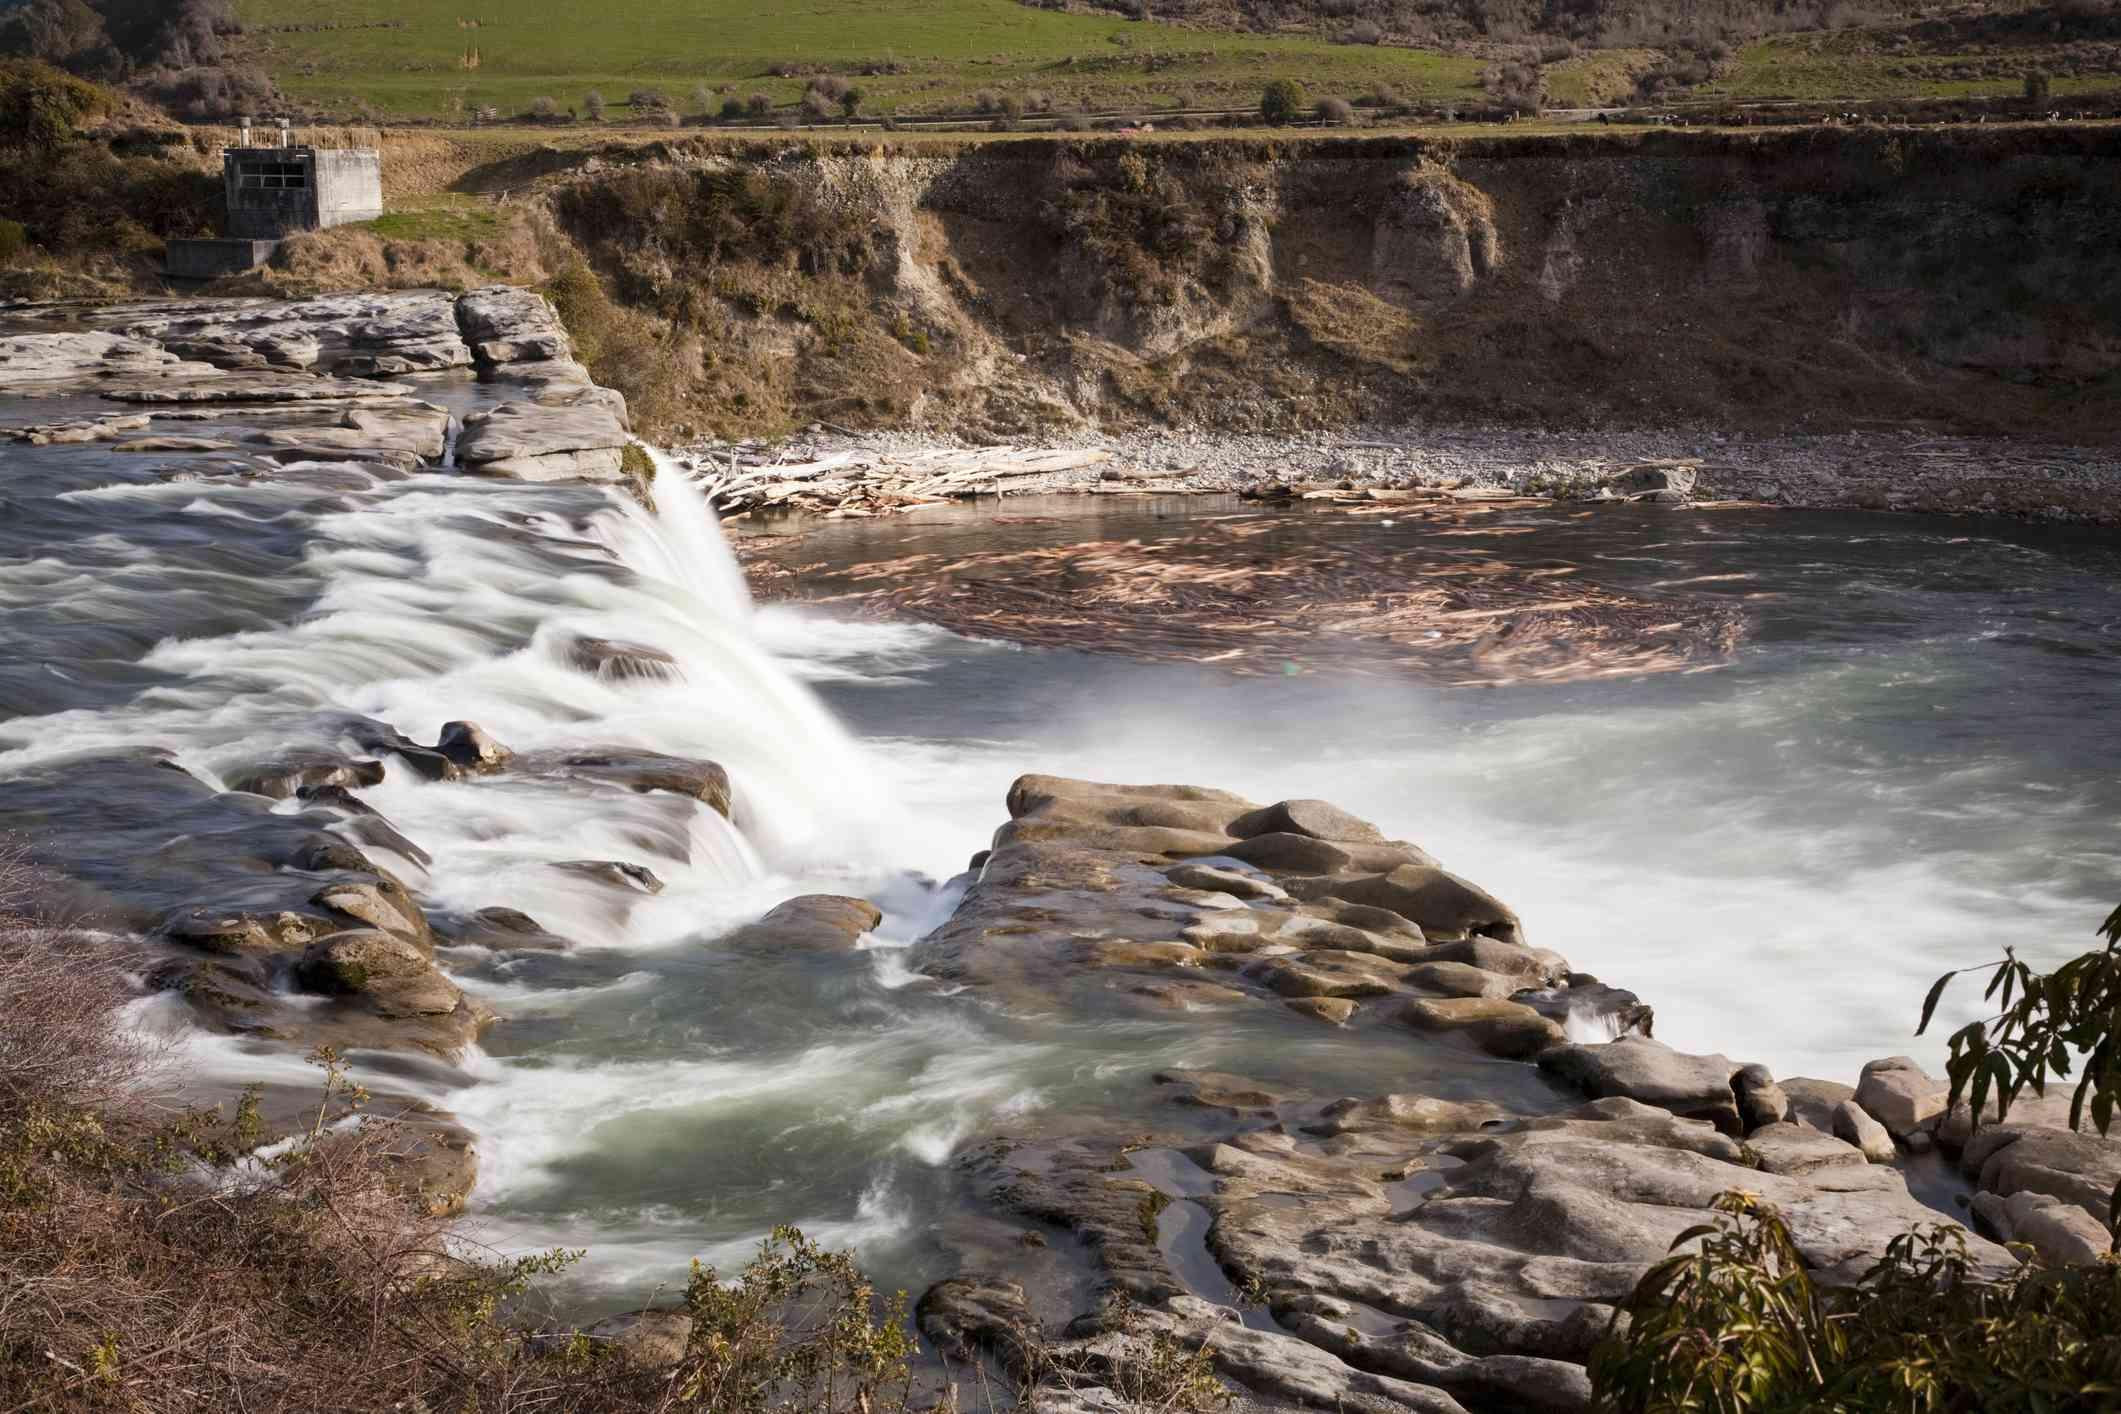 water falling in a short waterfall on a rocky riverbank